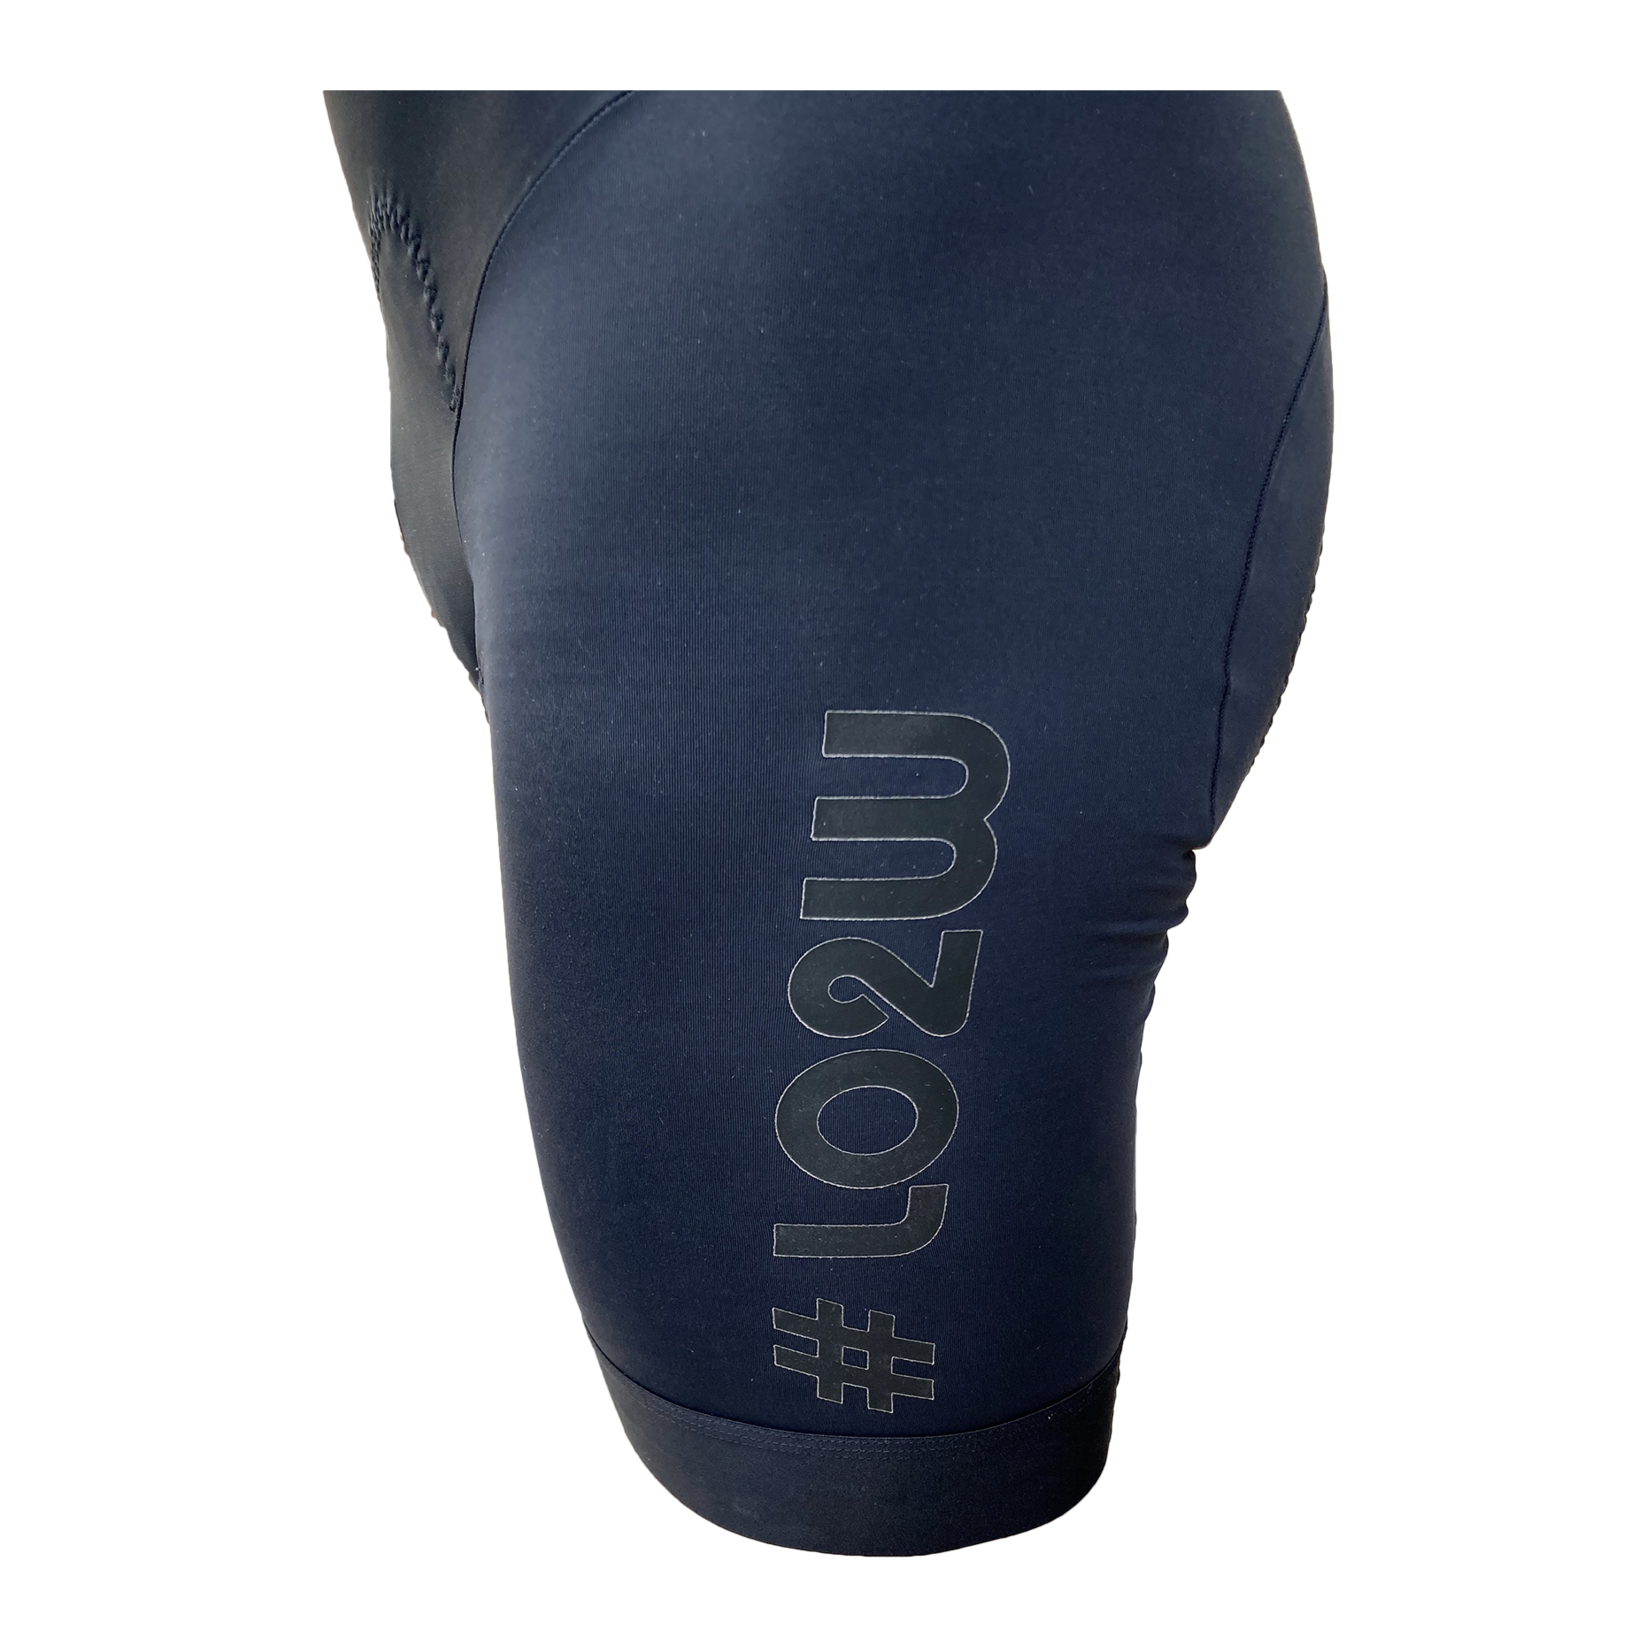 Assos LO2W® Team Bib Shorts